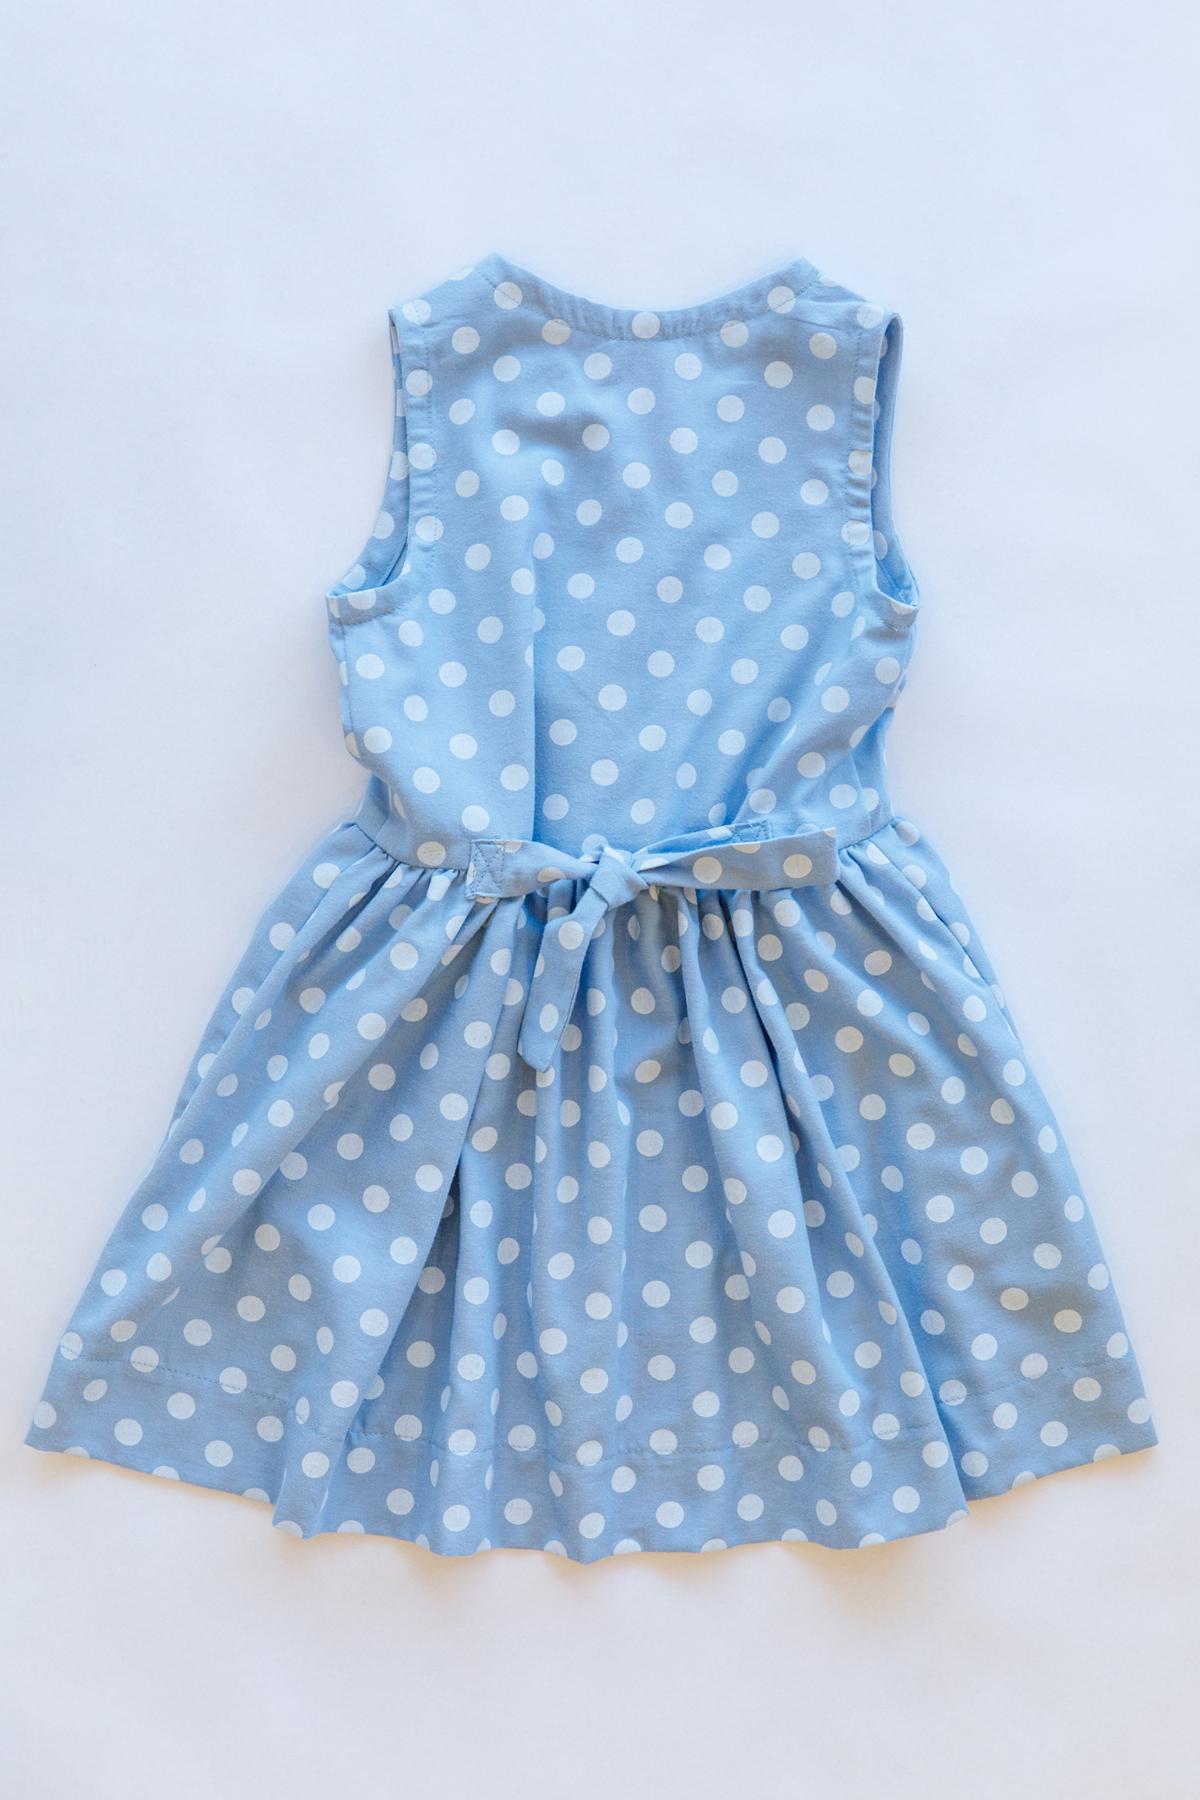 Mini Darling Ranges sleeveless dress back